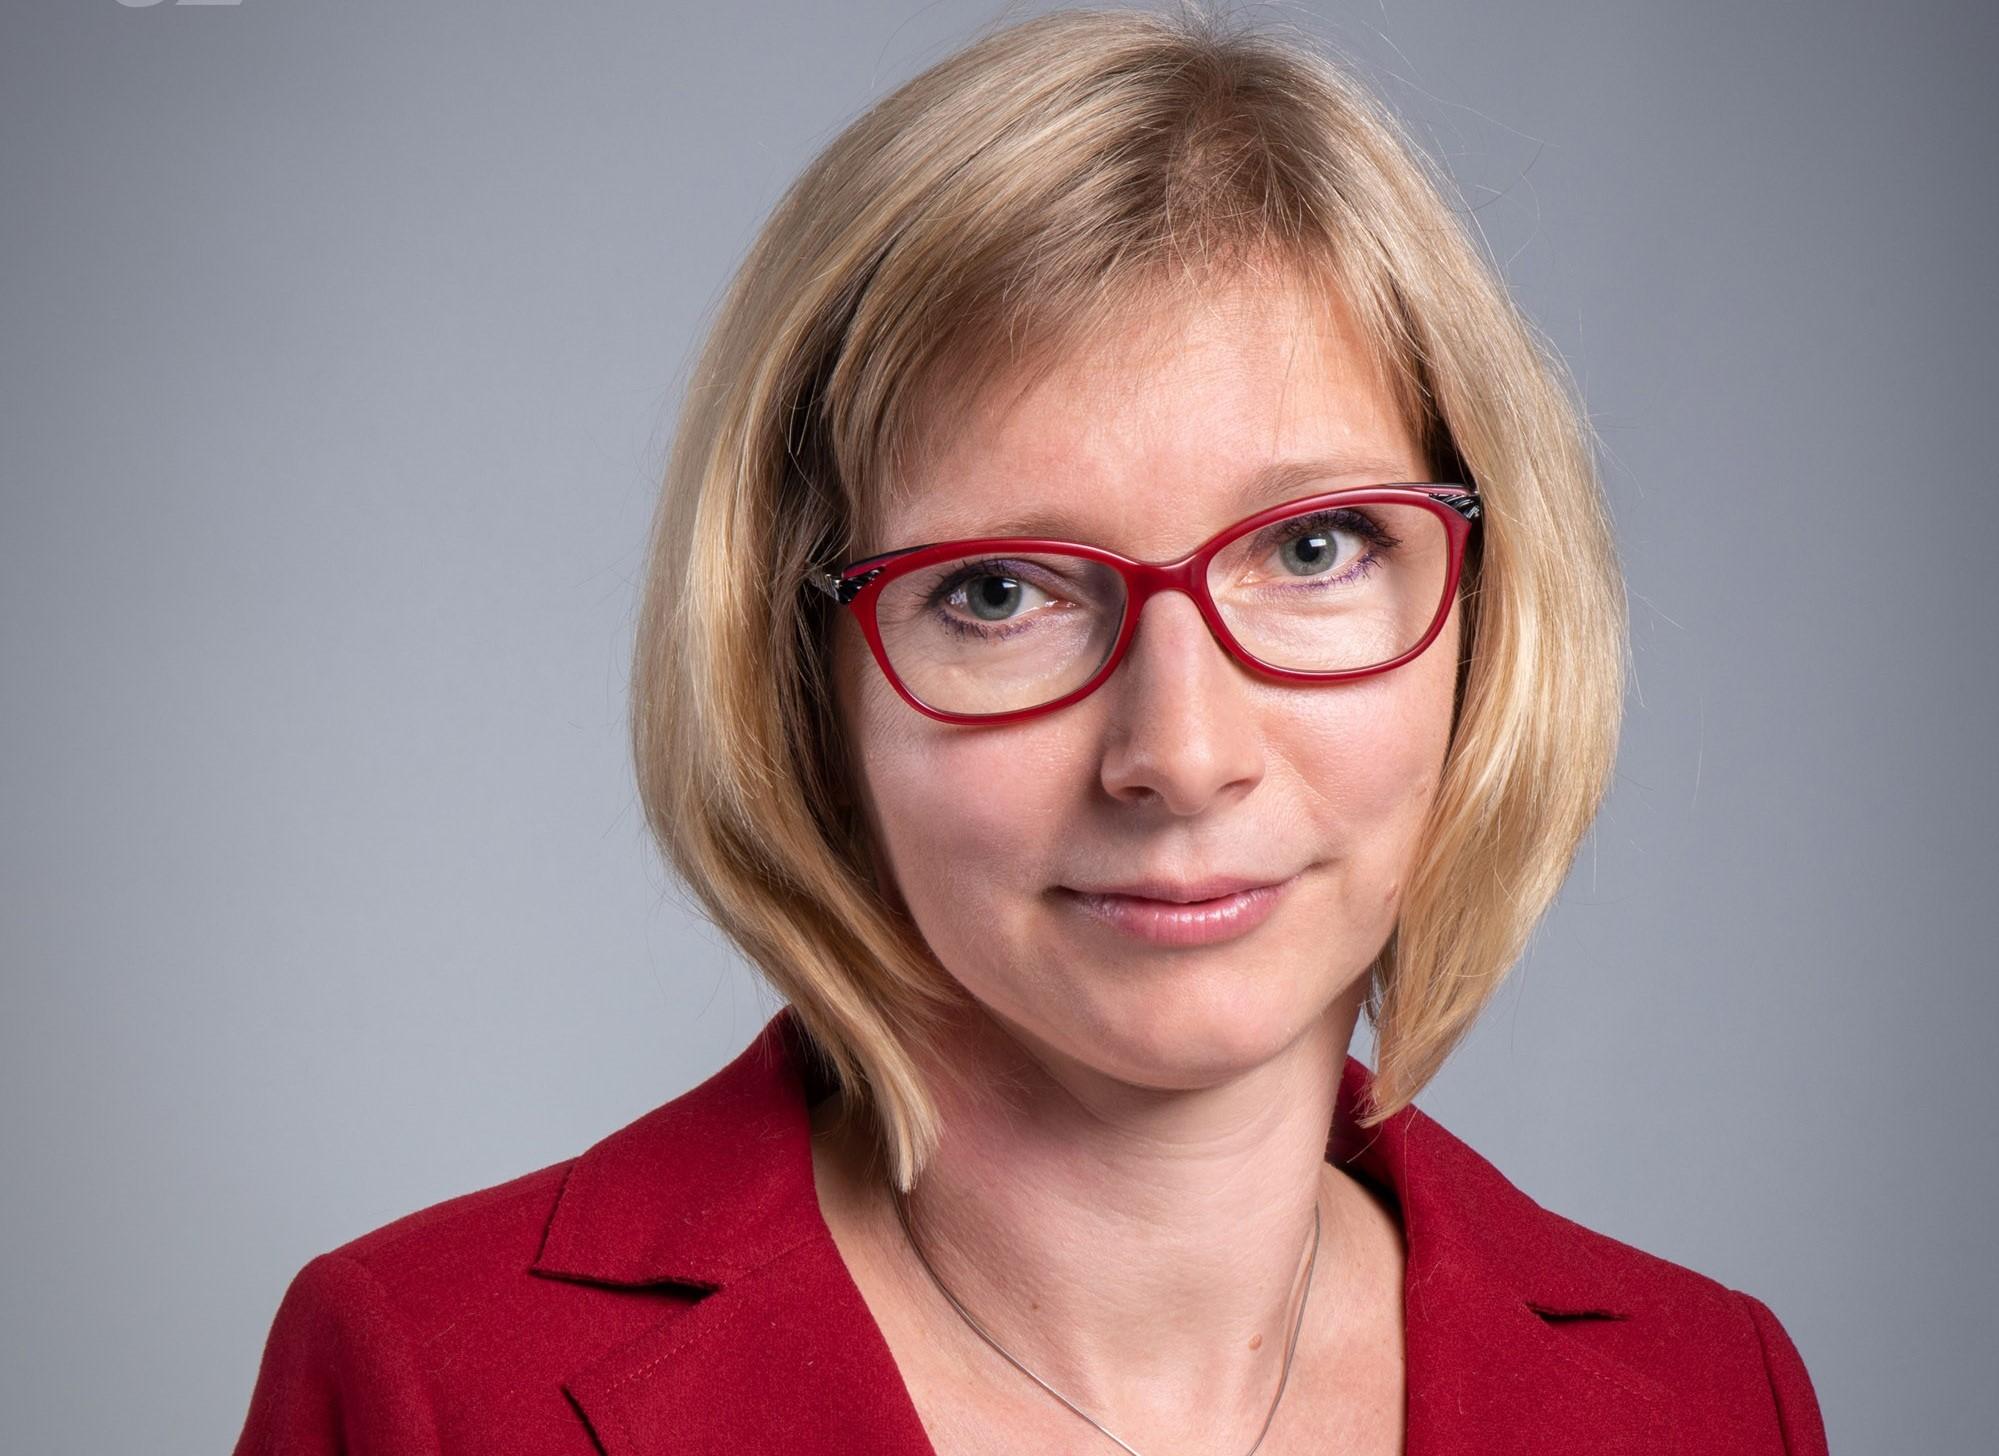 Agnieszka-Grzesiok-Horosz